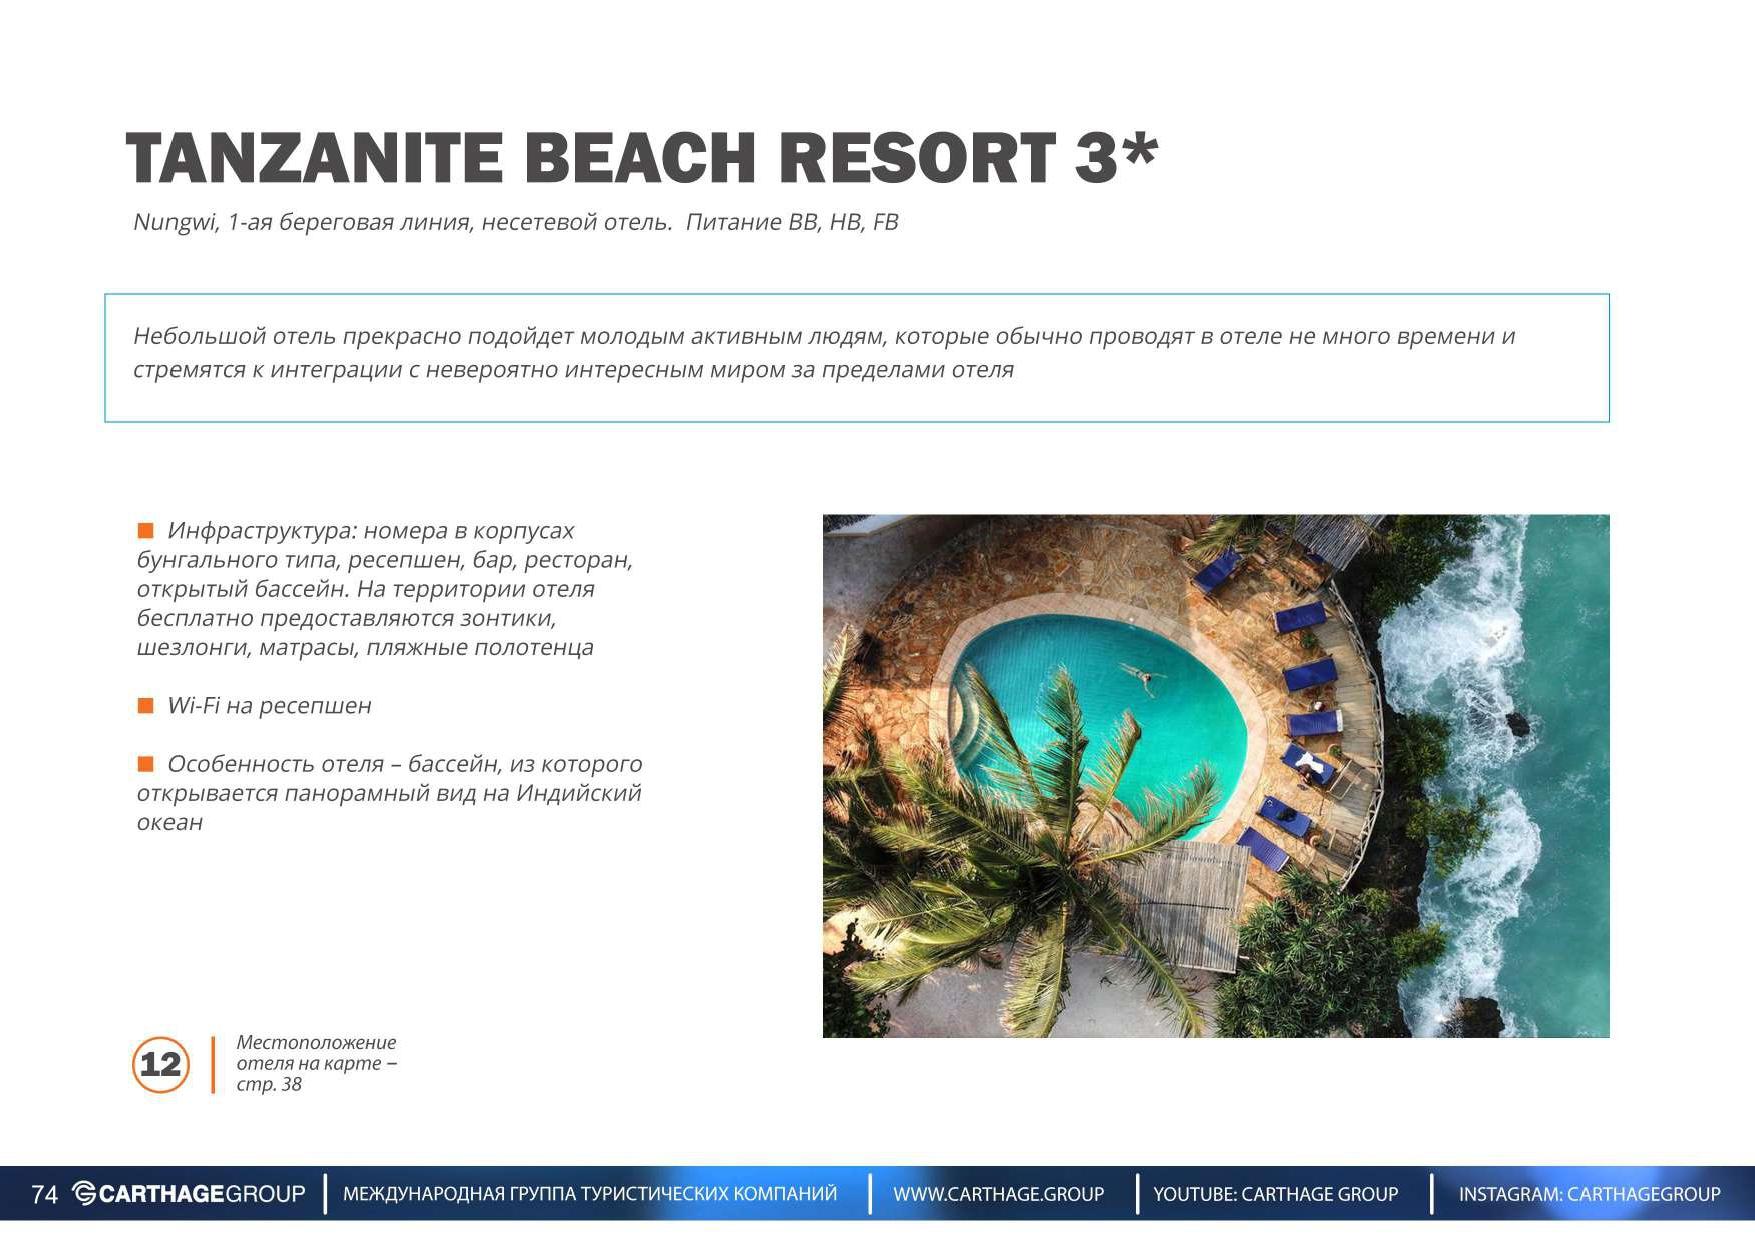 27.11 - Zanzibar Presentation 2020-2021_page-0074